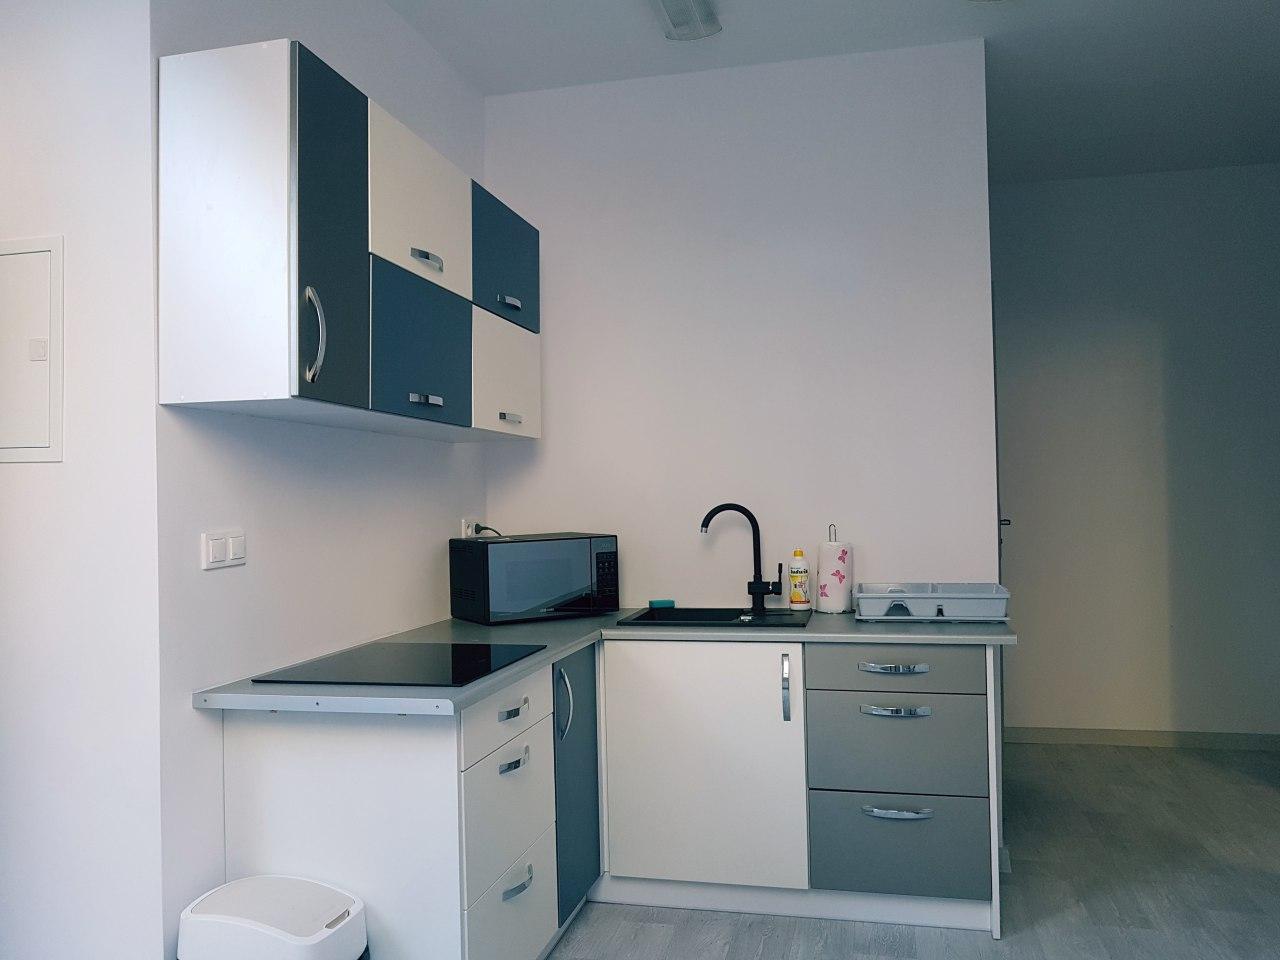 Mieszkanie 1, kuchnia